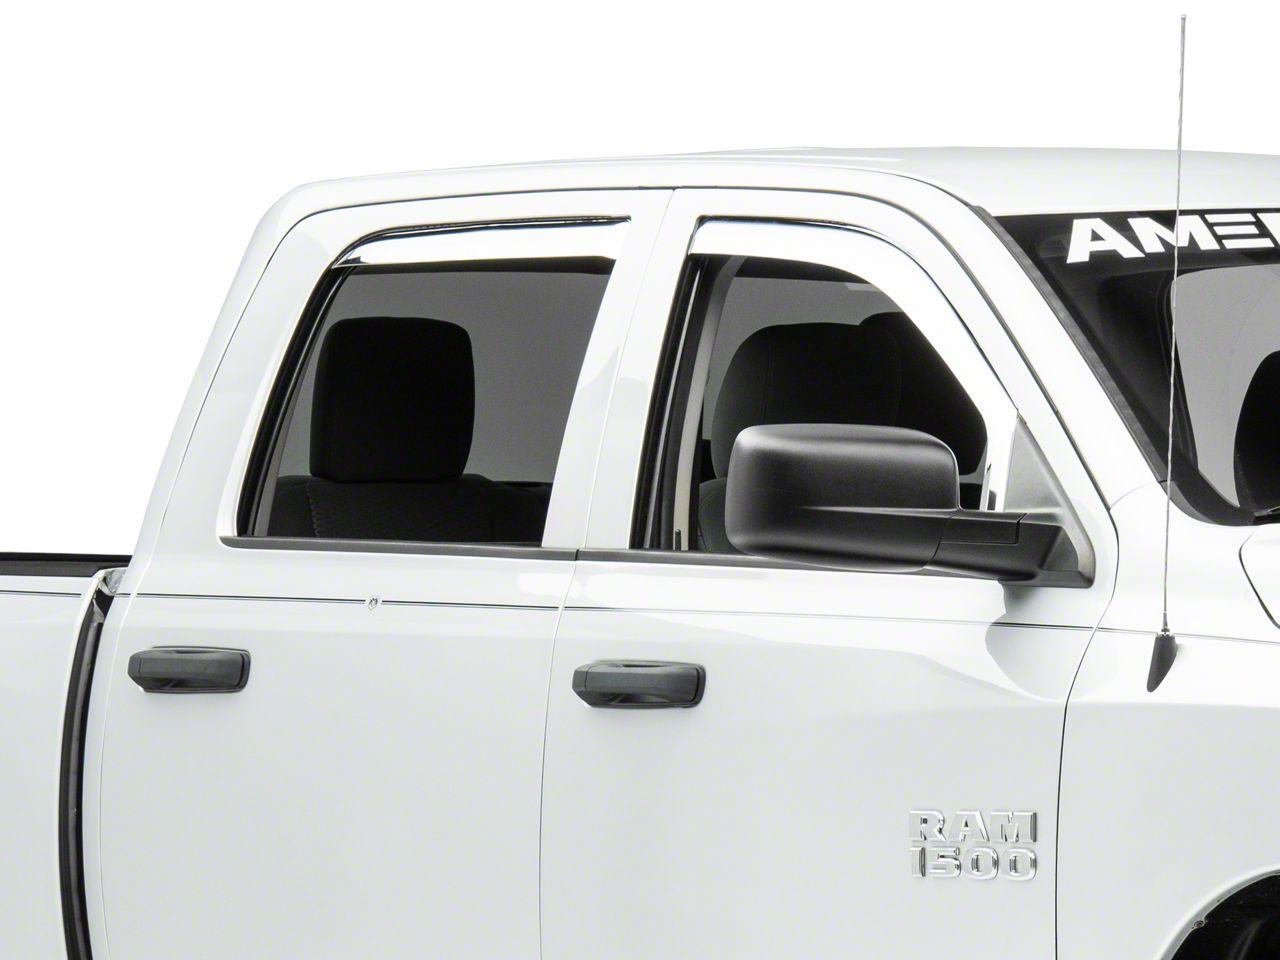 Outside Exterior Door Handle Chrome Rear LH RH Side for Silverado Sierra Truck